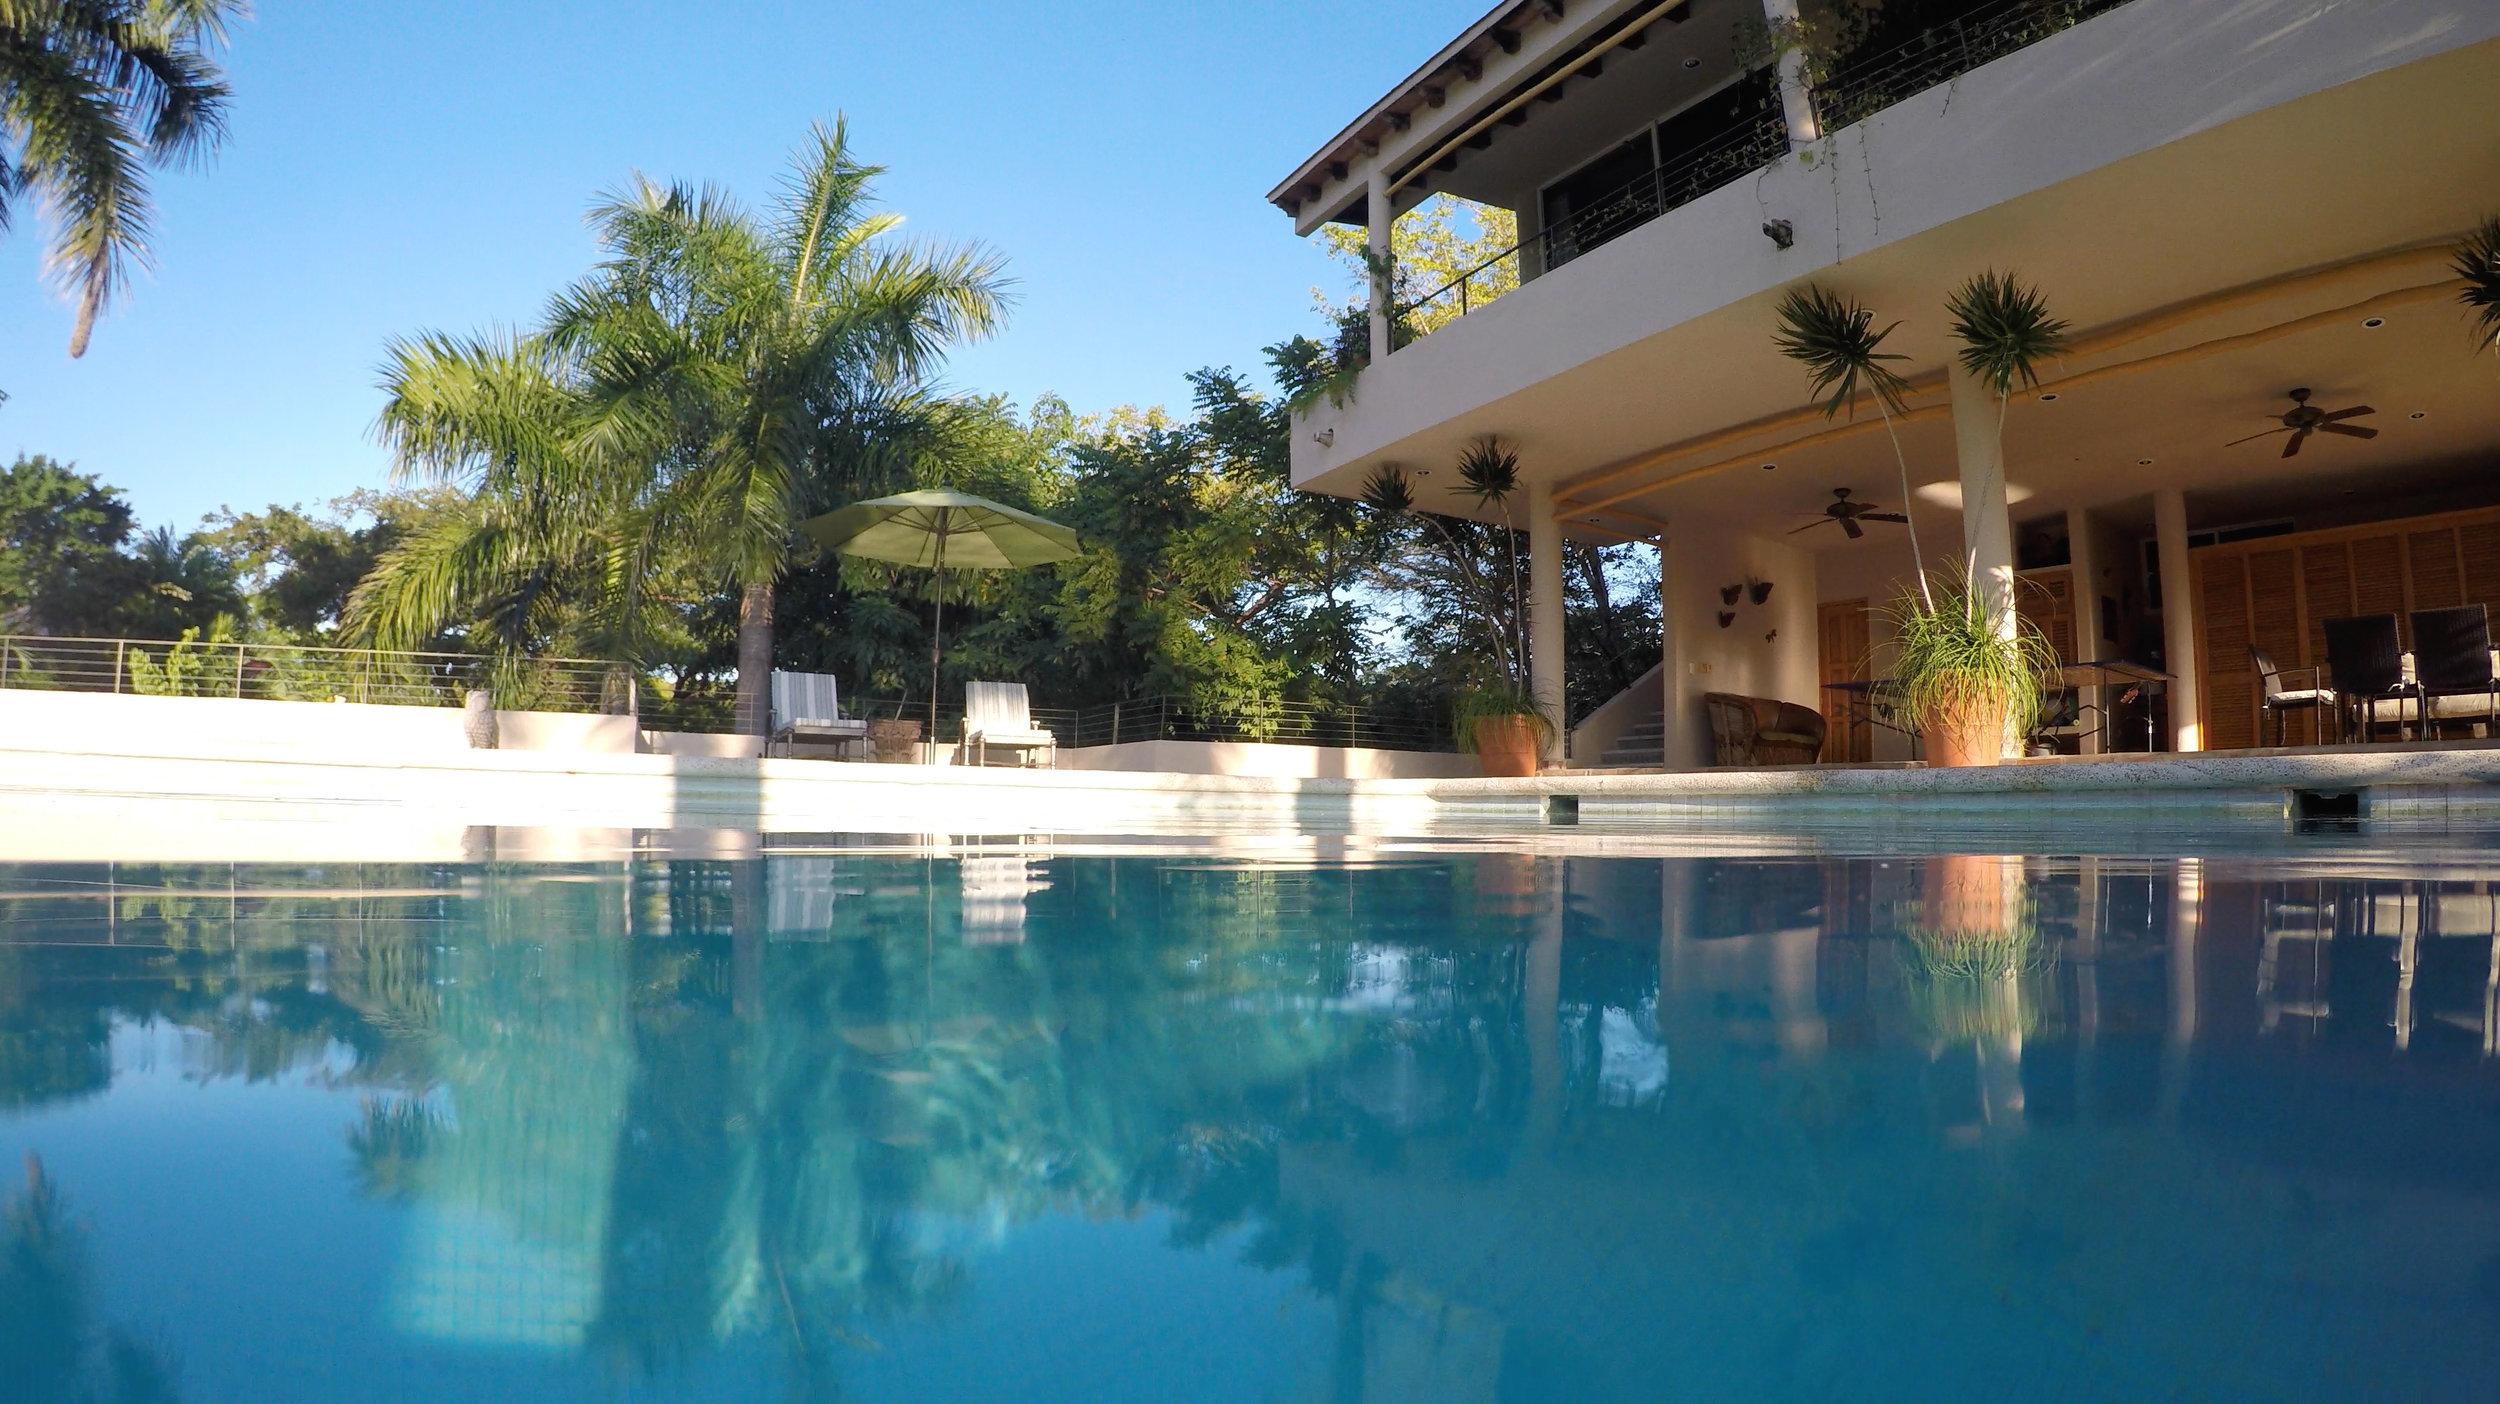 Hacienda+Alegre-8.jpg